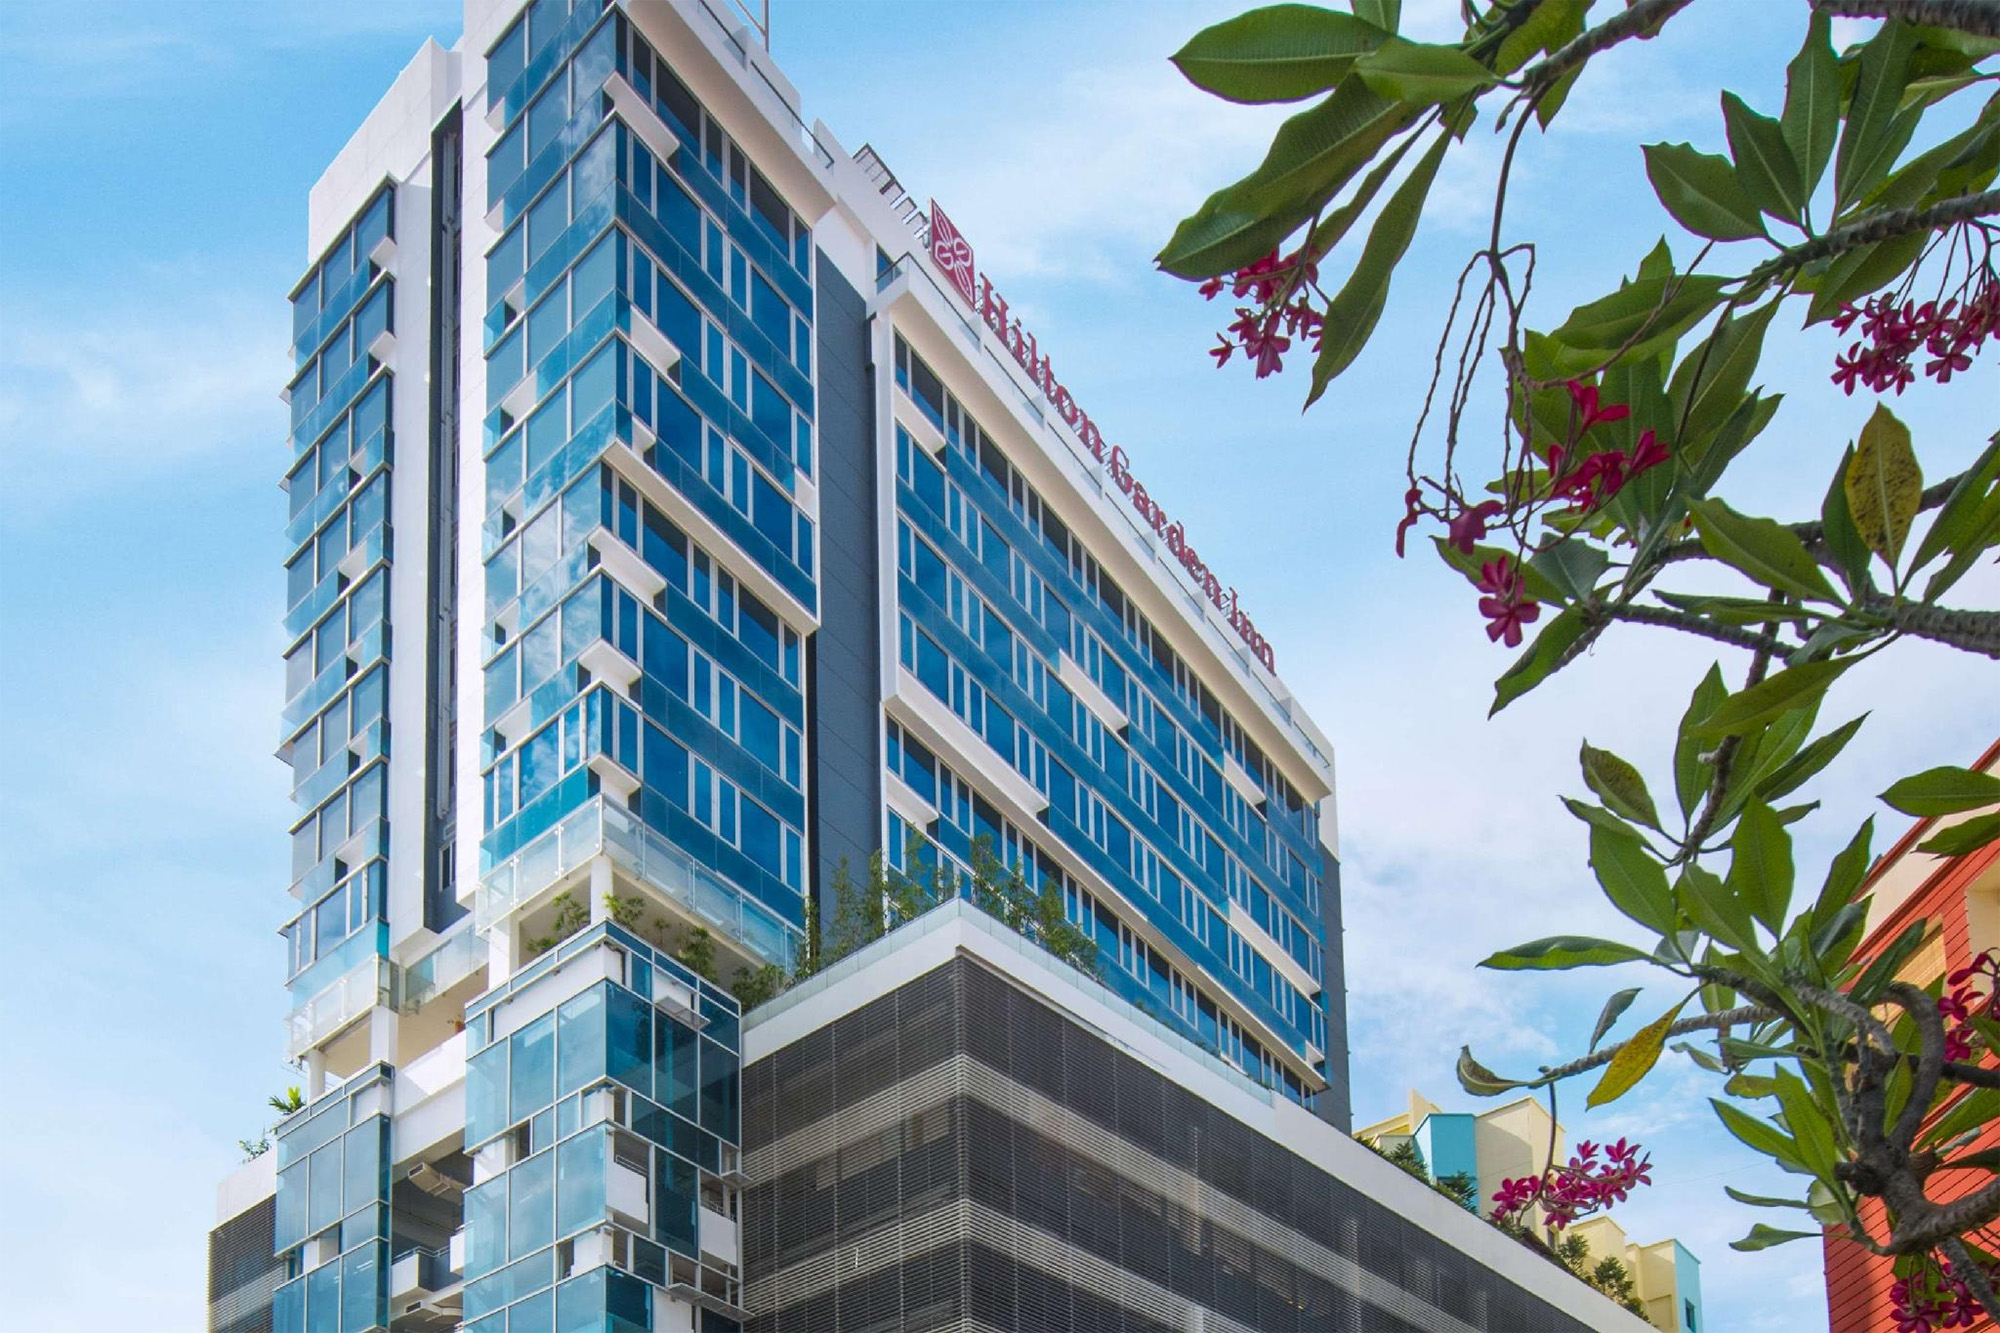 Hilton Garden Inn Singapore